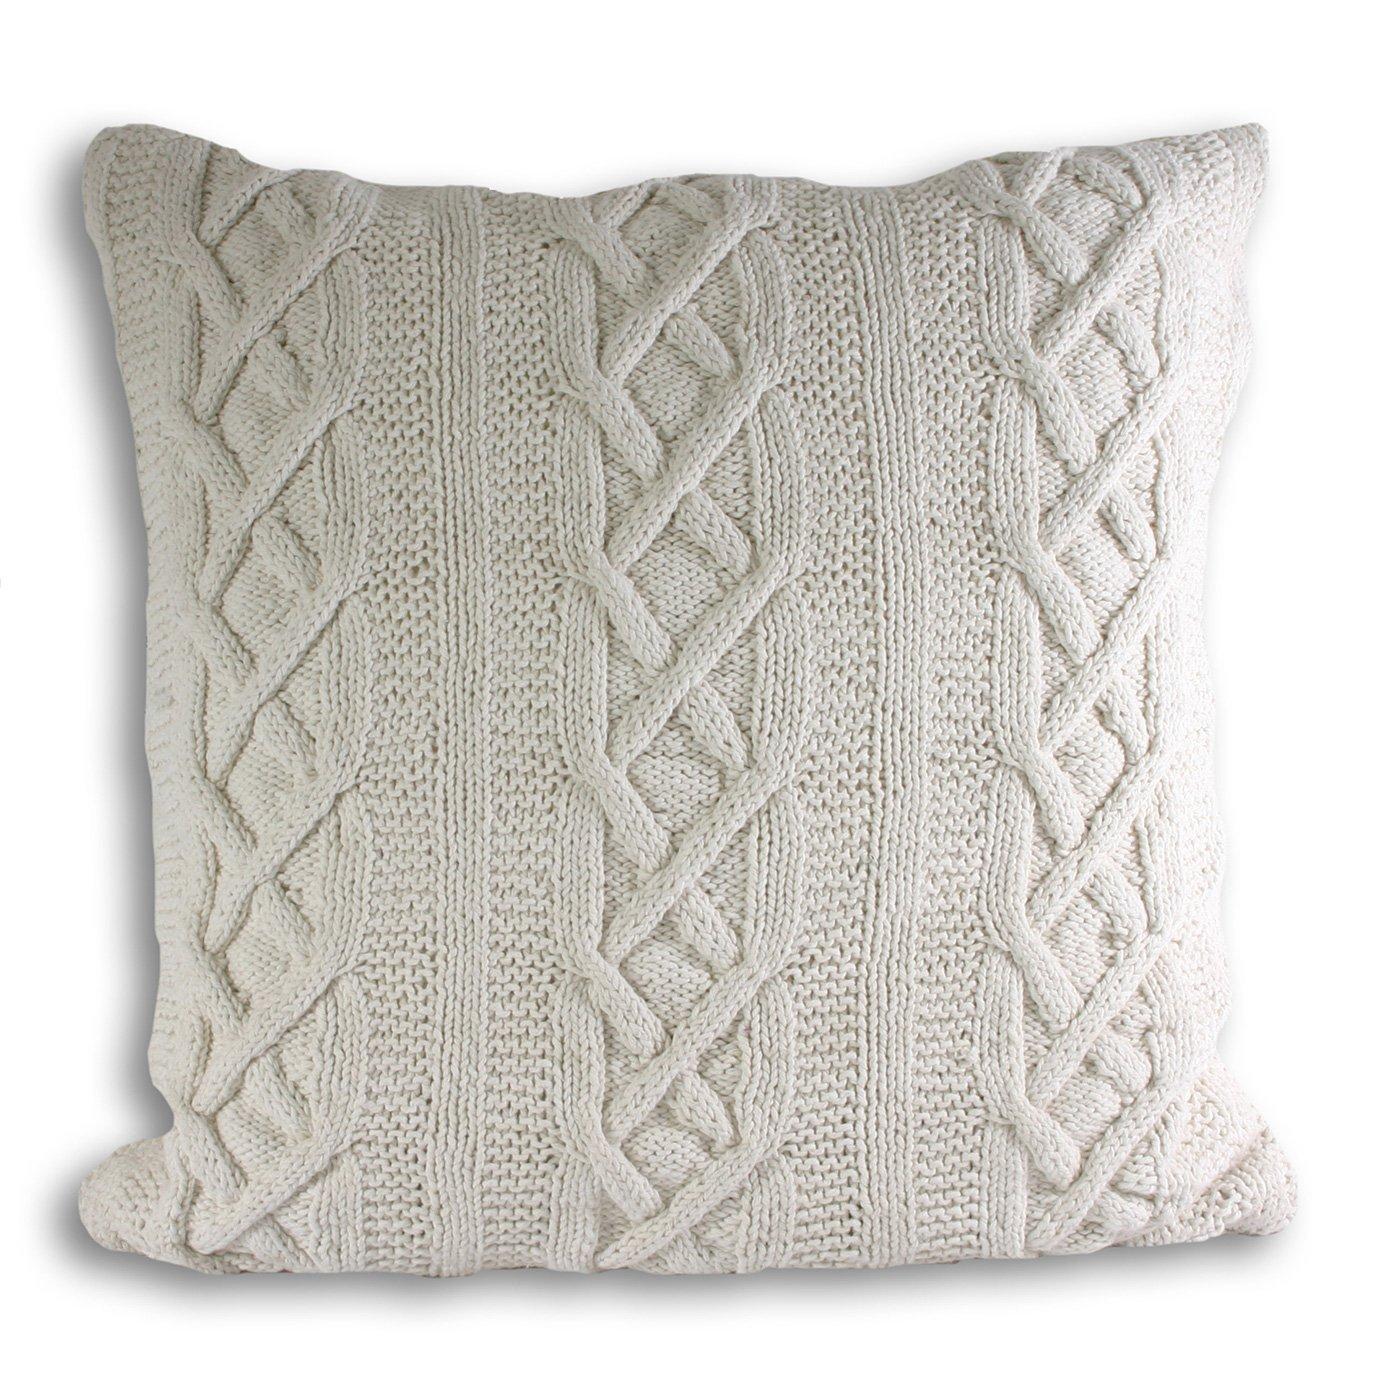 knitted cushions aran knitted cushion cover, mushroom, 55 x 55 cm: amazon.co.uk: kitchen u0026 znnonwn